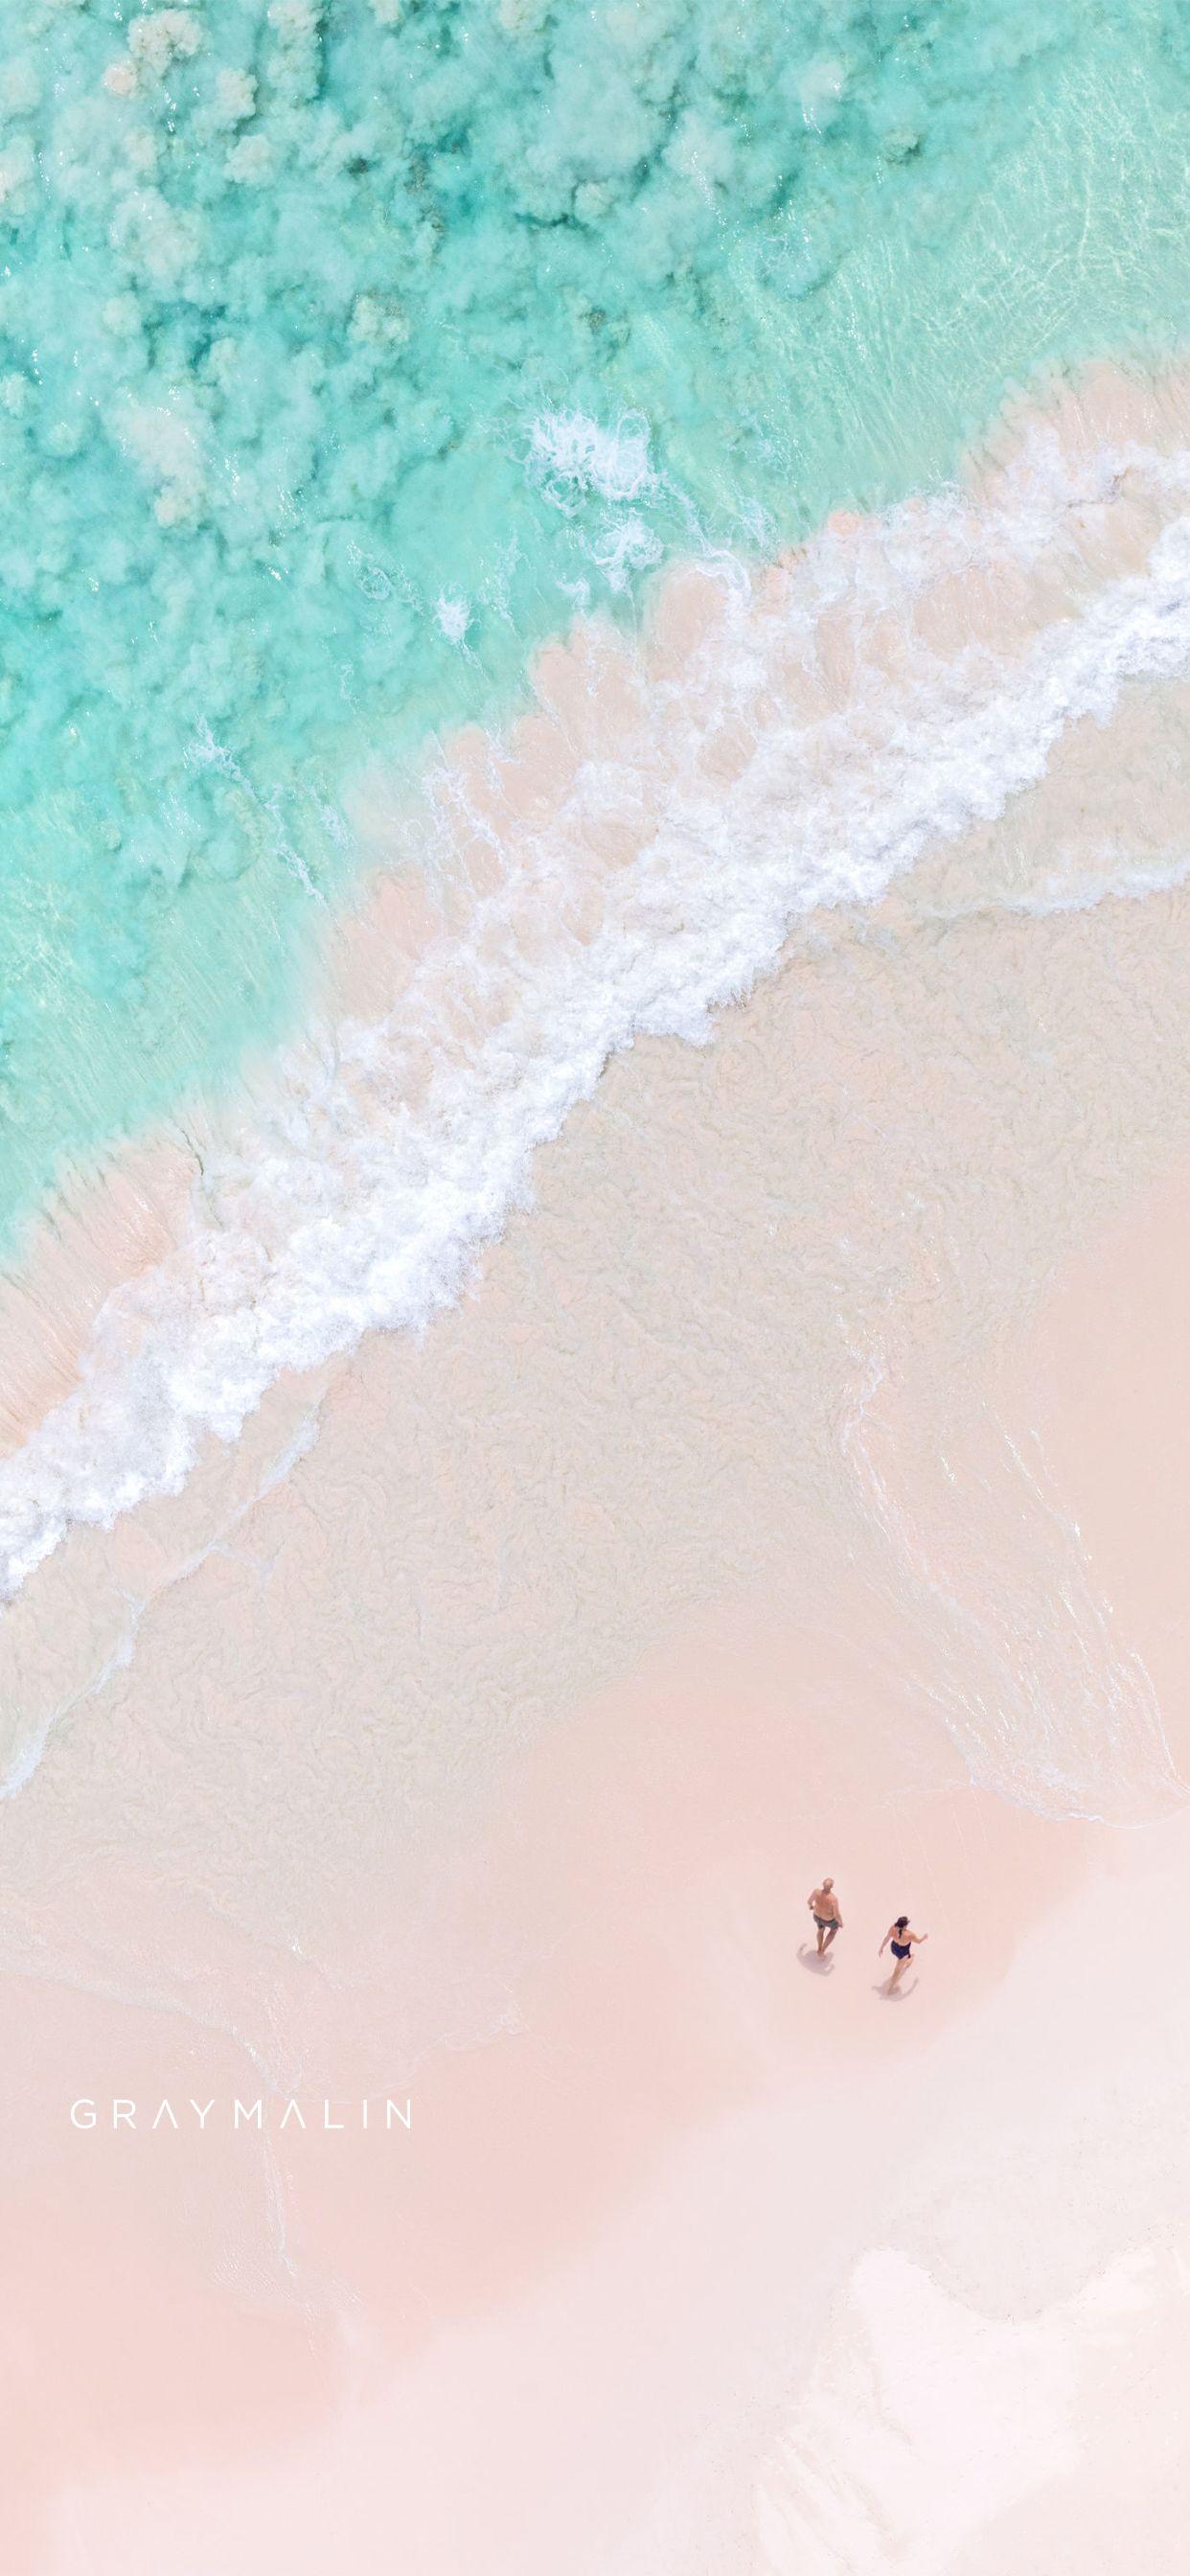 Gray Malin Iphone Wallpaper